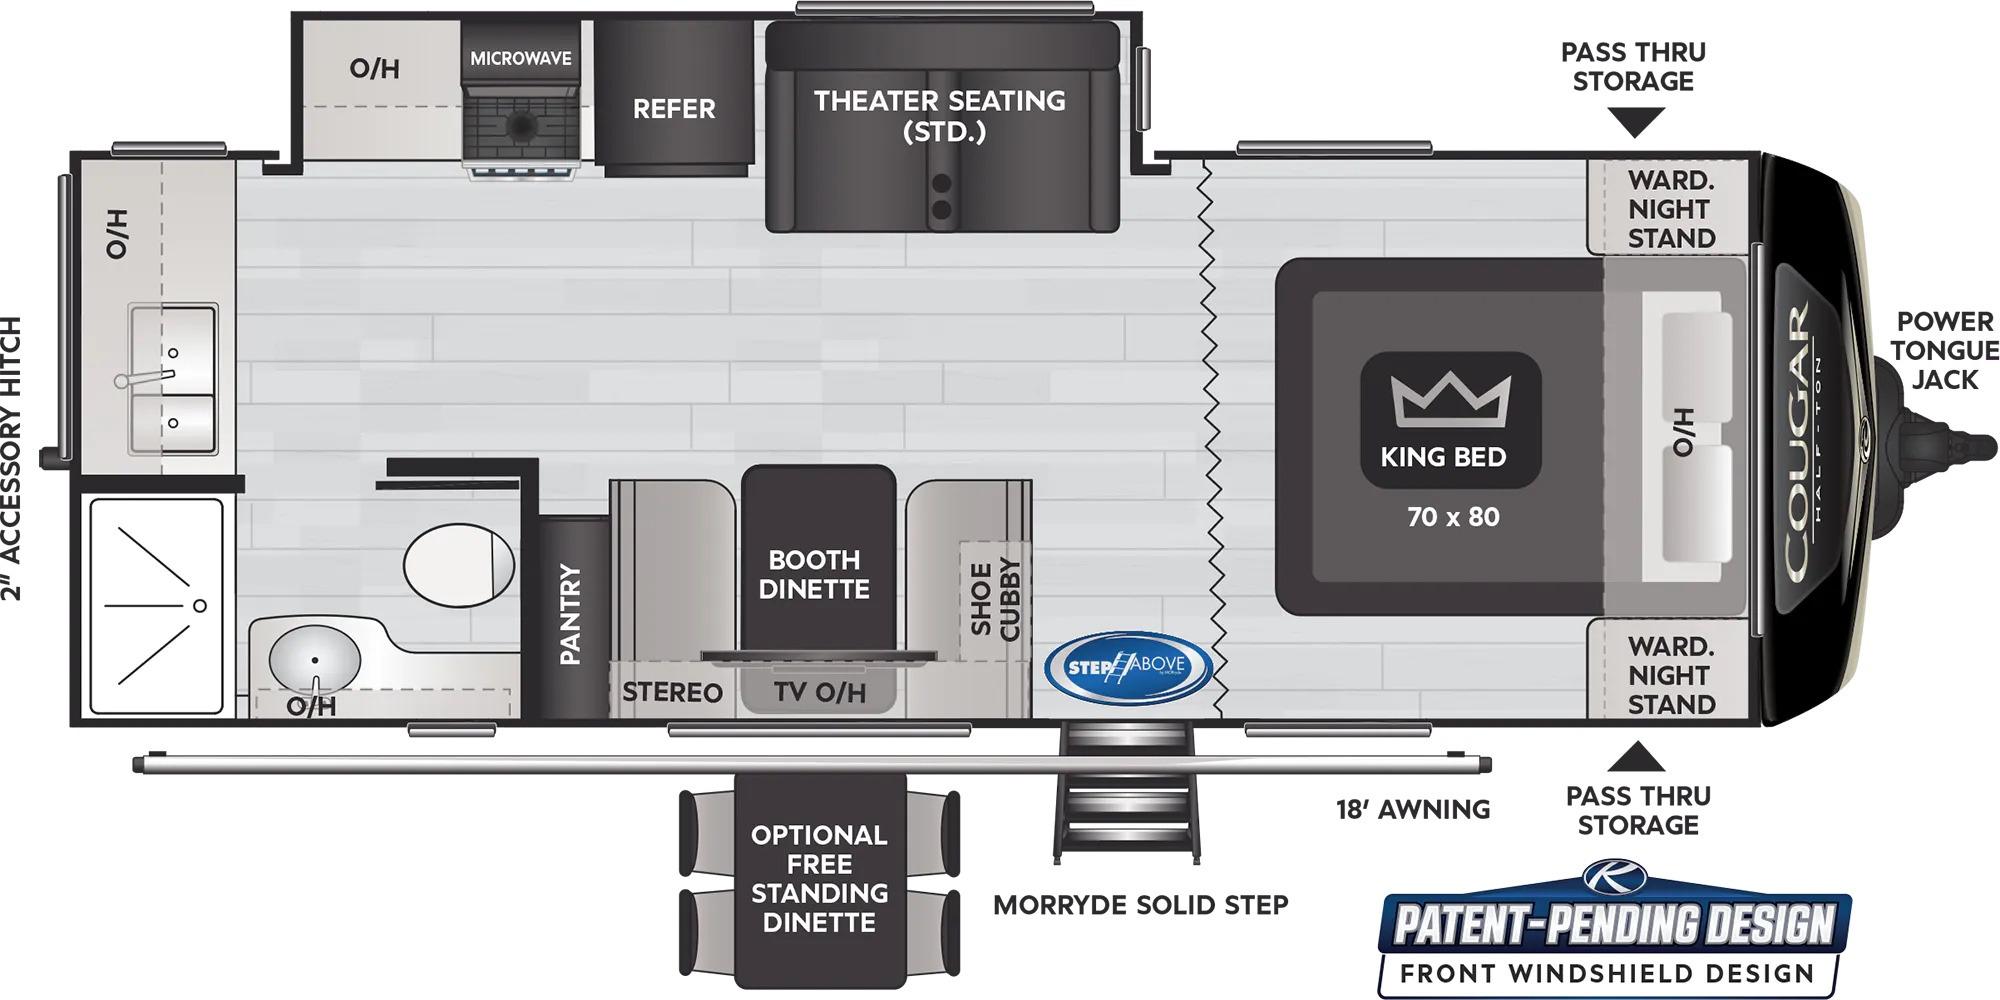 View Floor Plan for 2022 KEYSTONE COUGAR 22MLSWE